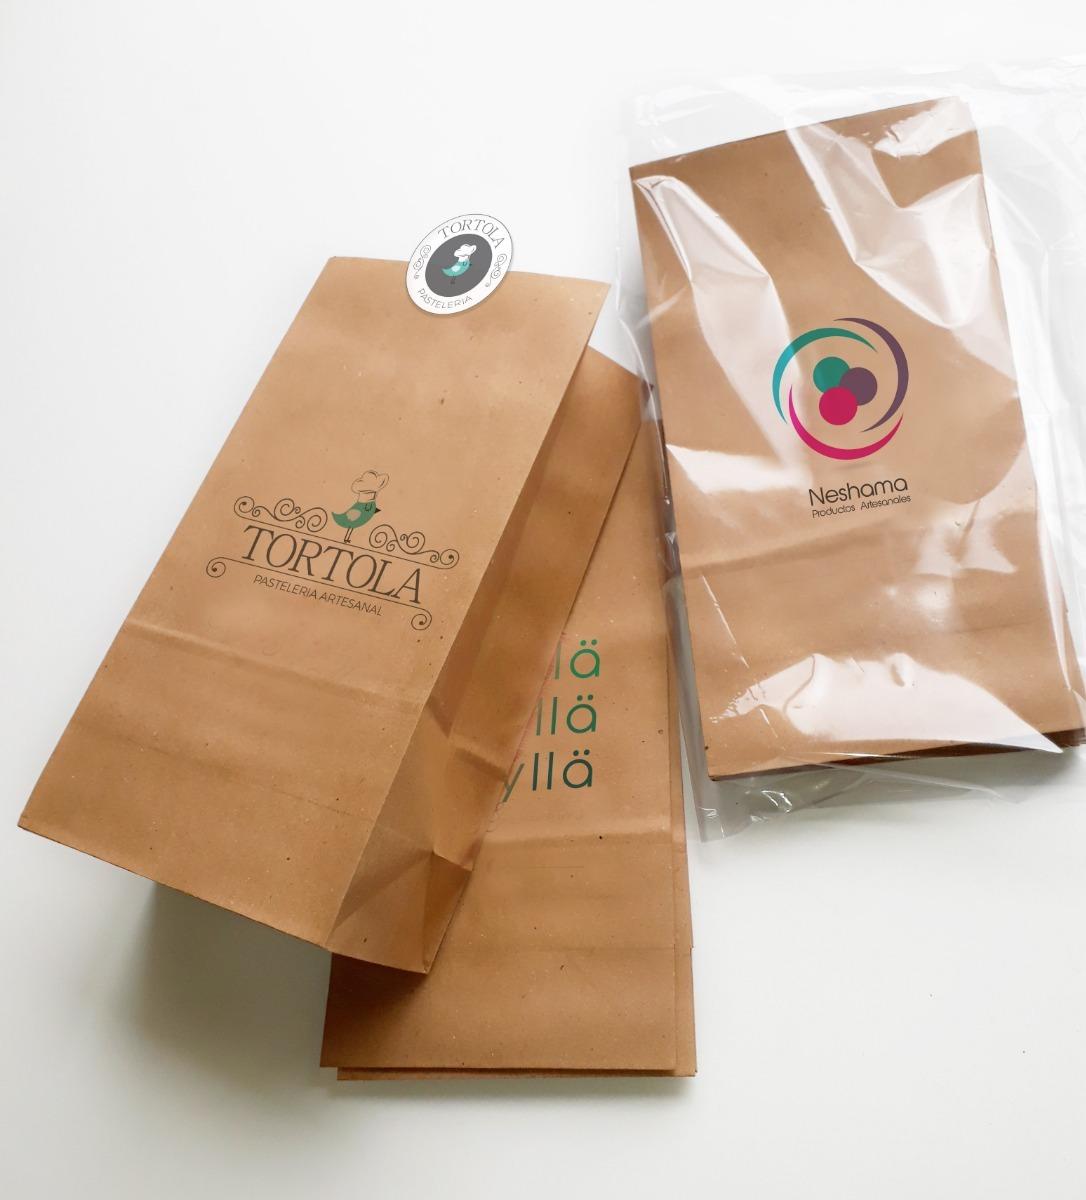 59b22b9df pack bolsas para packaging empresarial conbase personalizada. Cargando zoom.